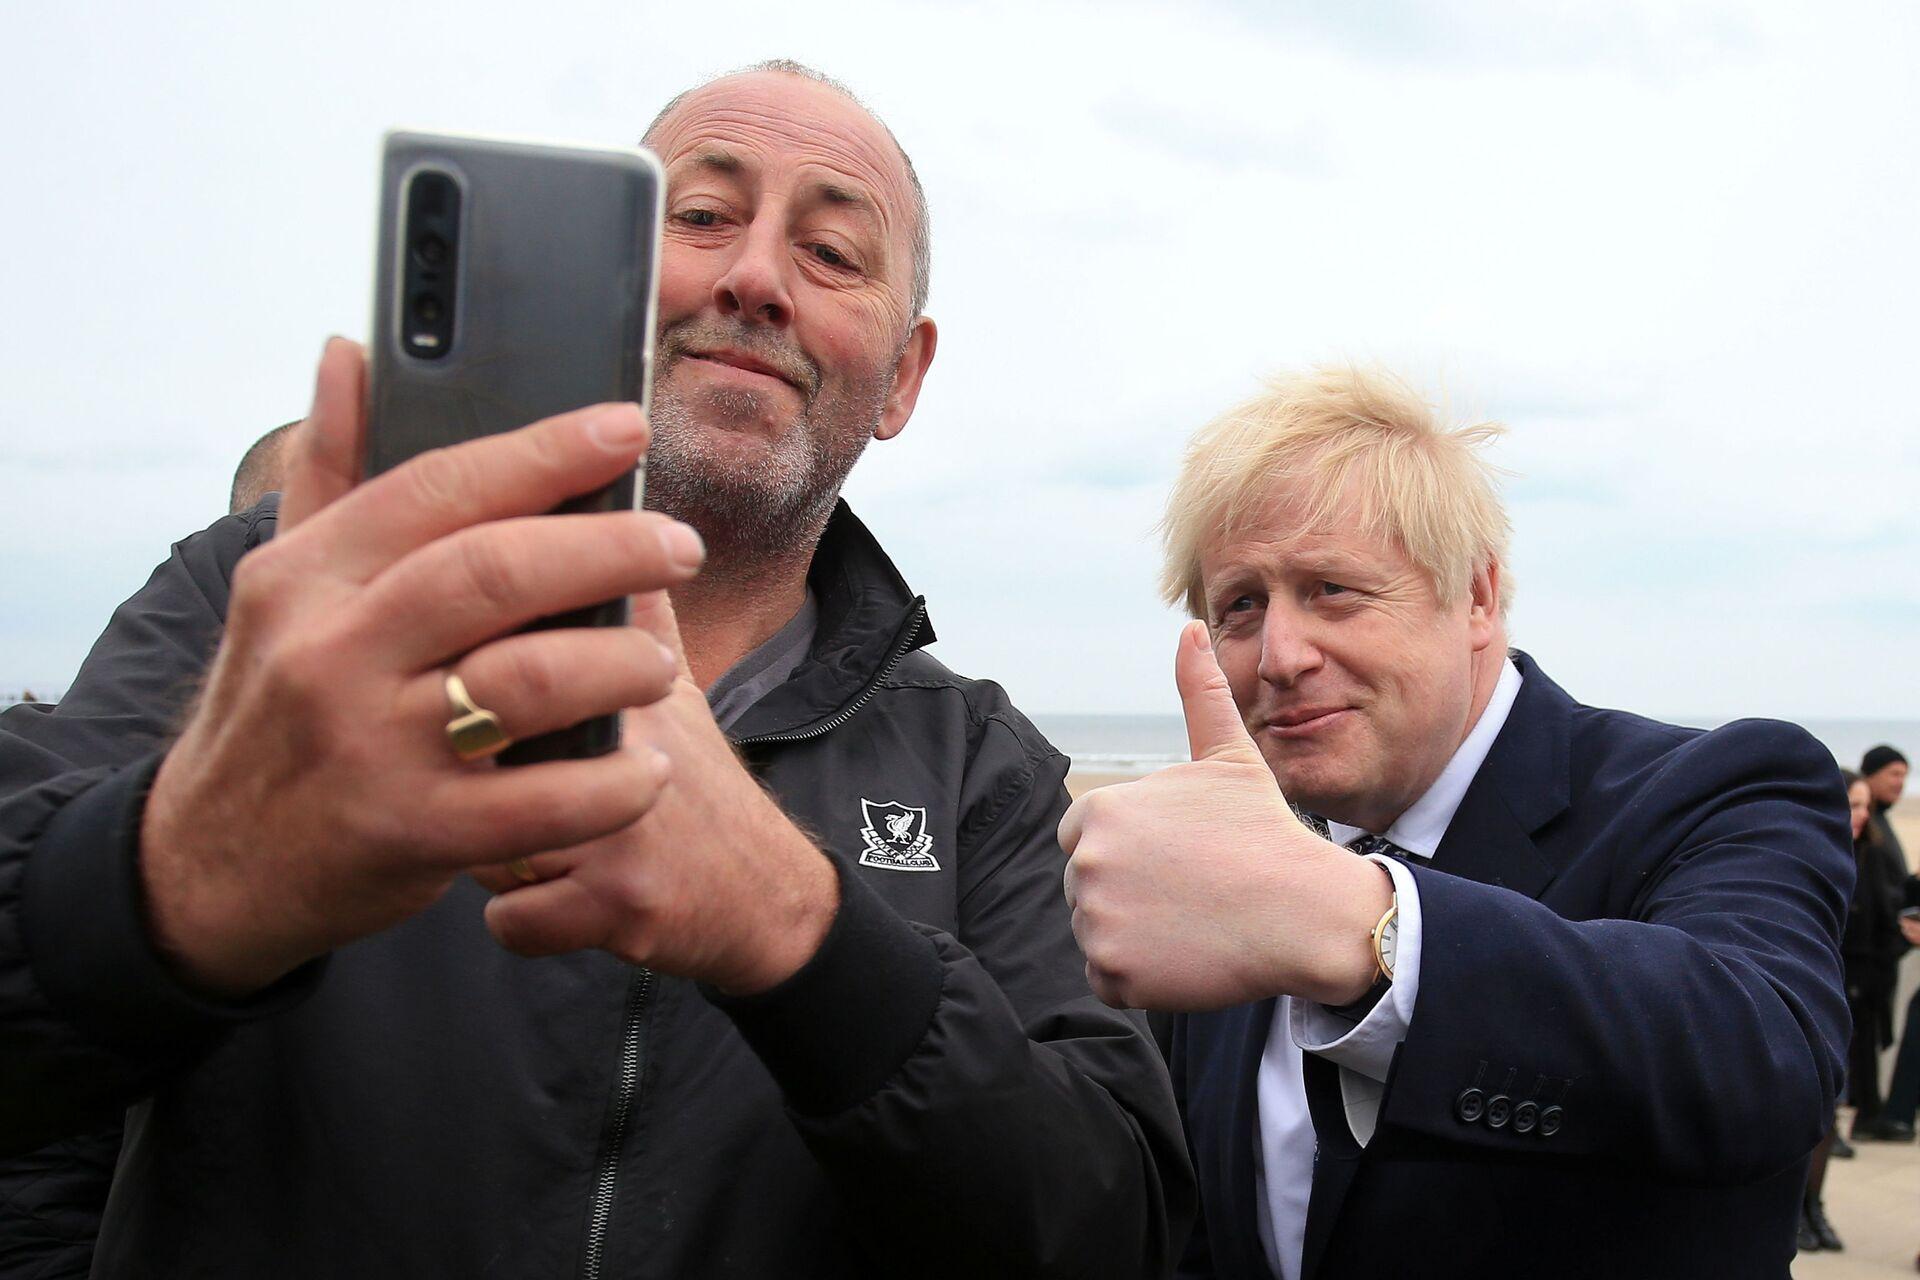 'Historic': UK Conservatives Win By-Election in Labour Stronghold Hartlepool - Sputnik International, 1920, 07.05.2021